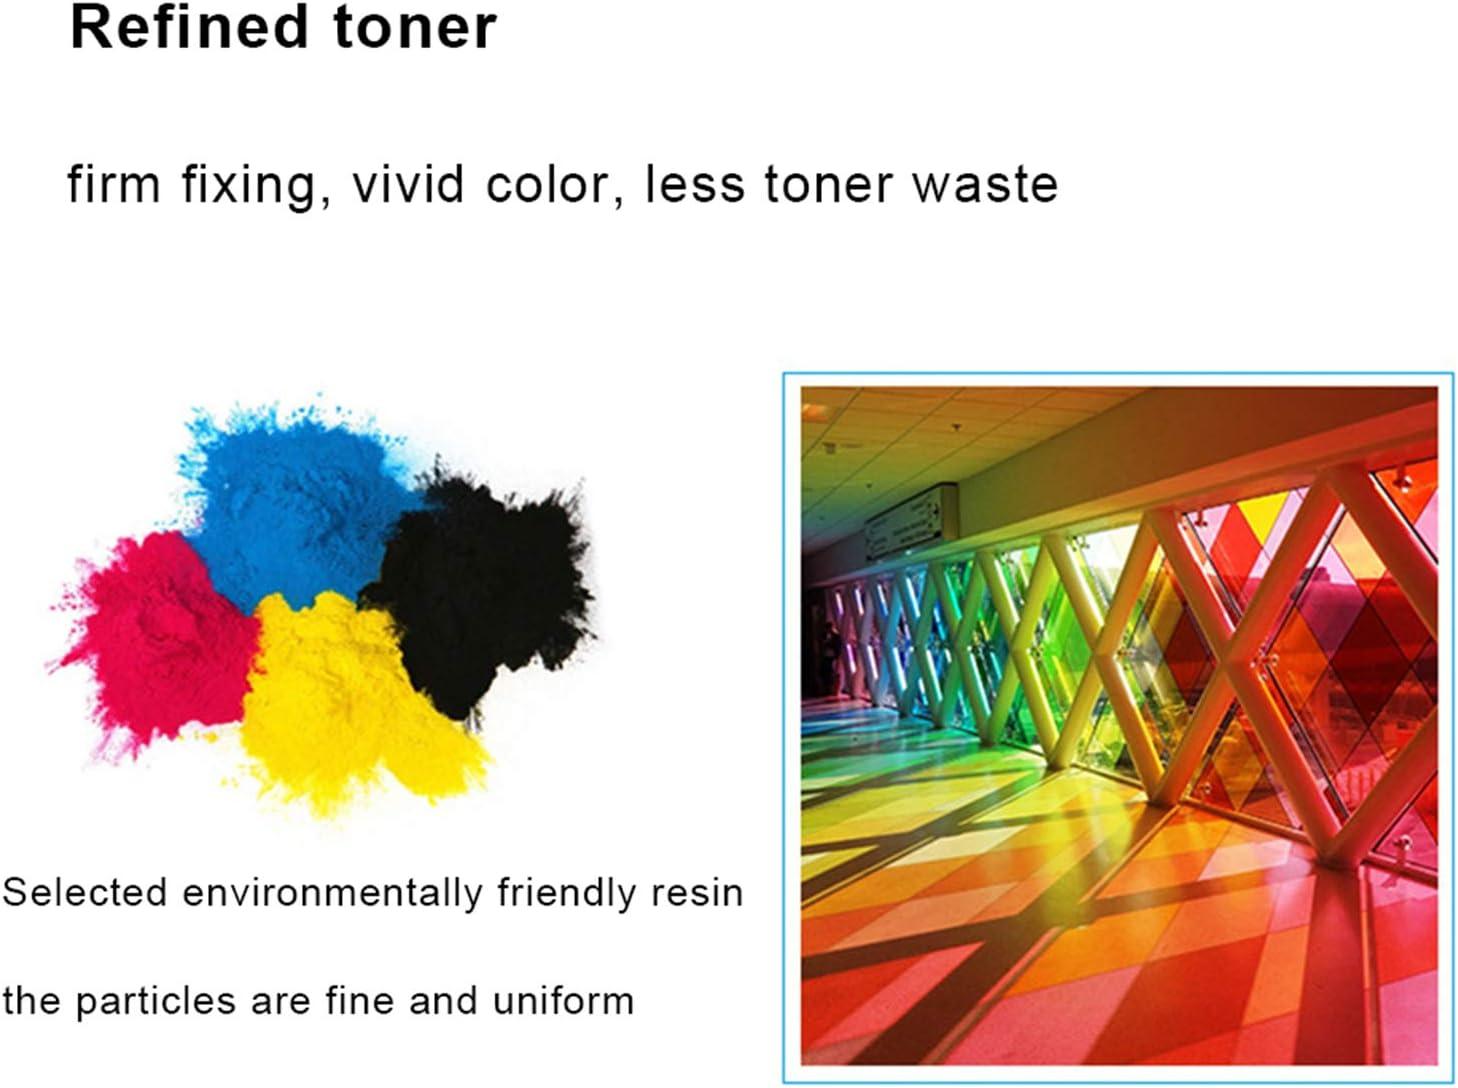 VDFHB Compatible Toner Cartridge Ct201829, CT201829,CT201830,CT201831 for Xerox 2275/3373/3375/4475/5575 Printer Black